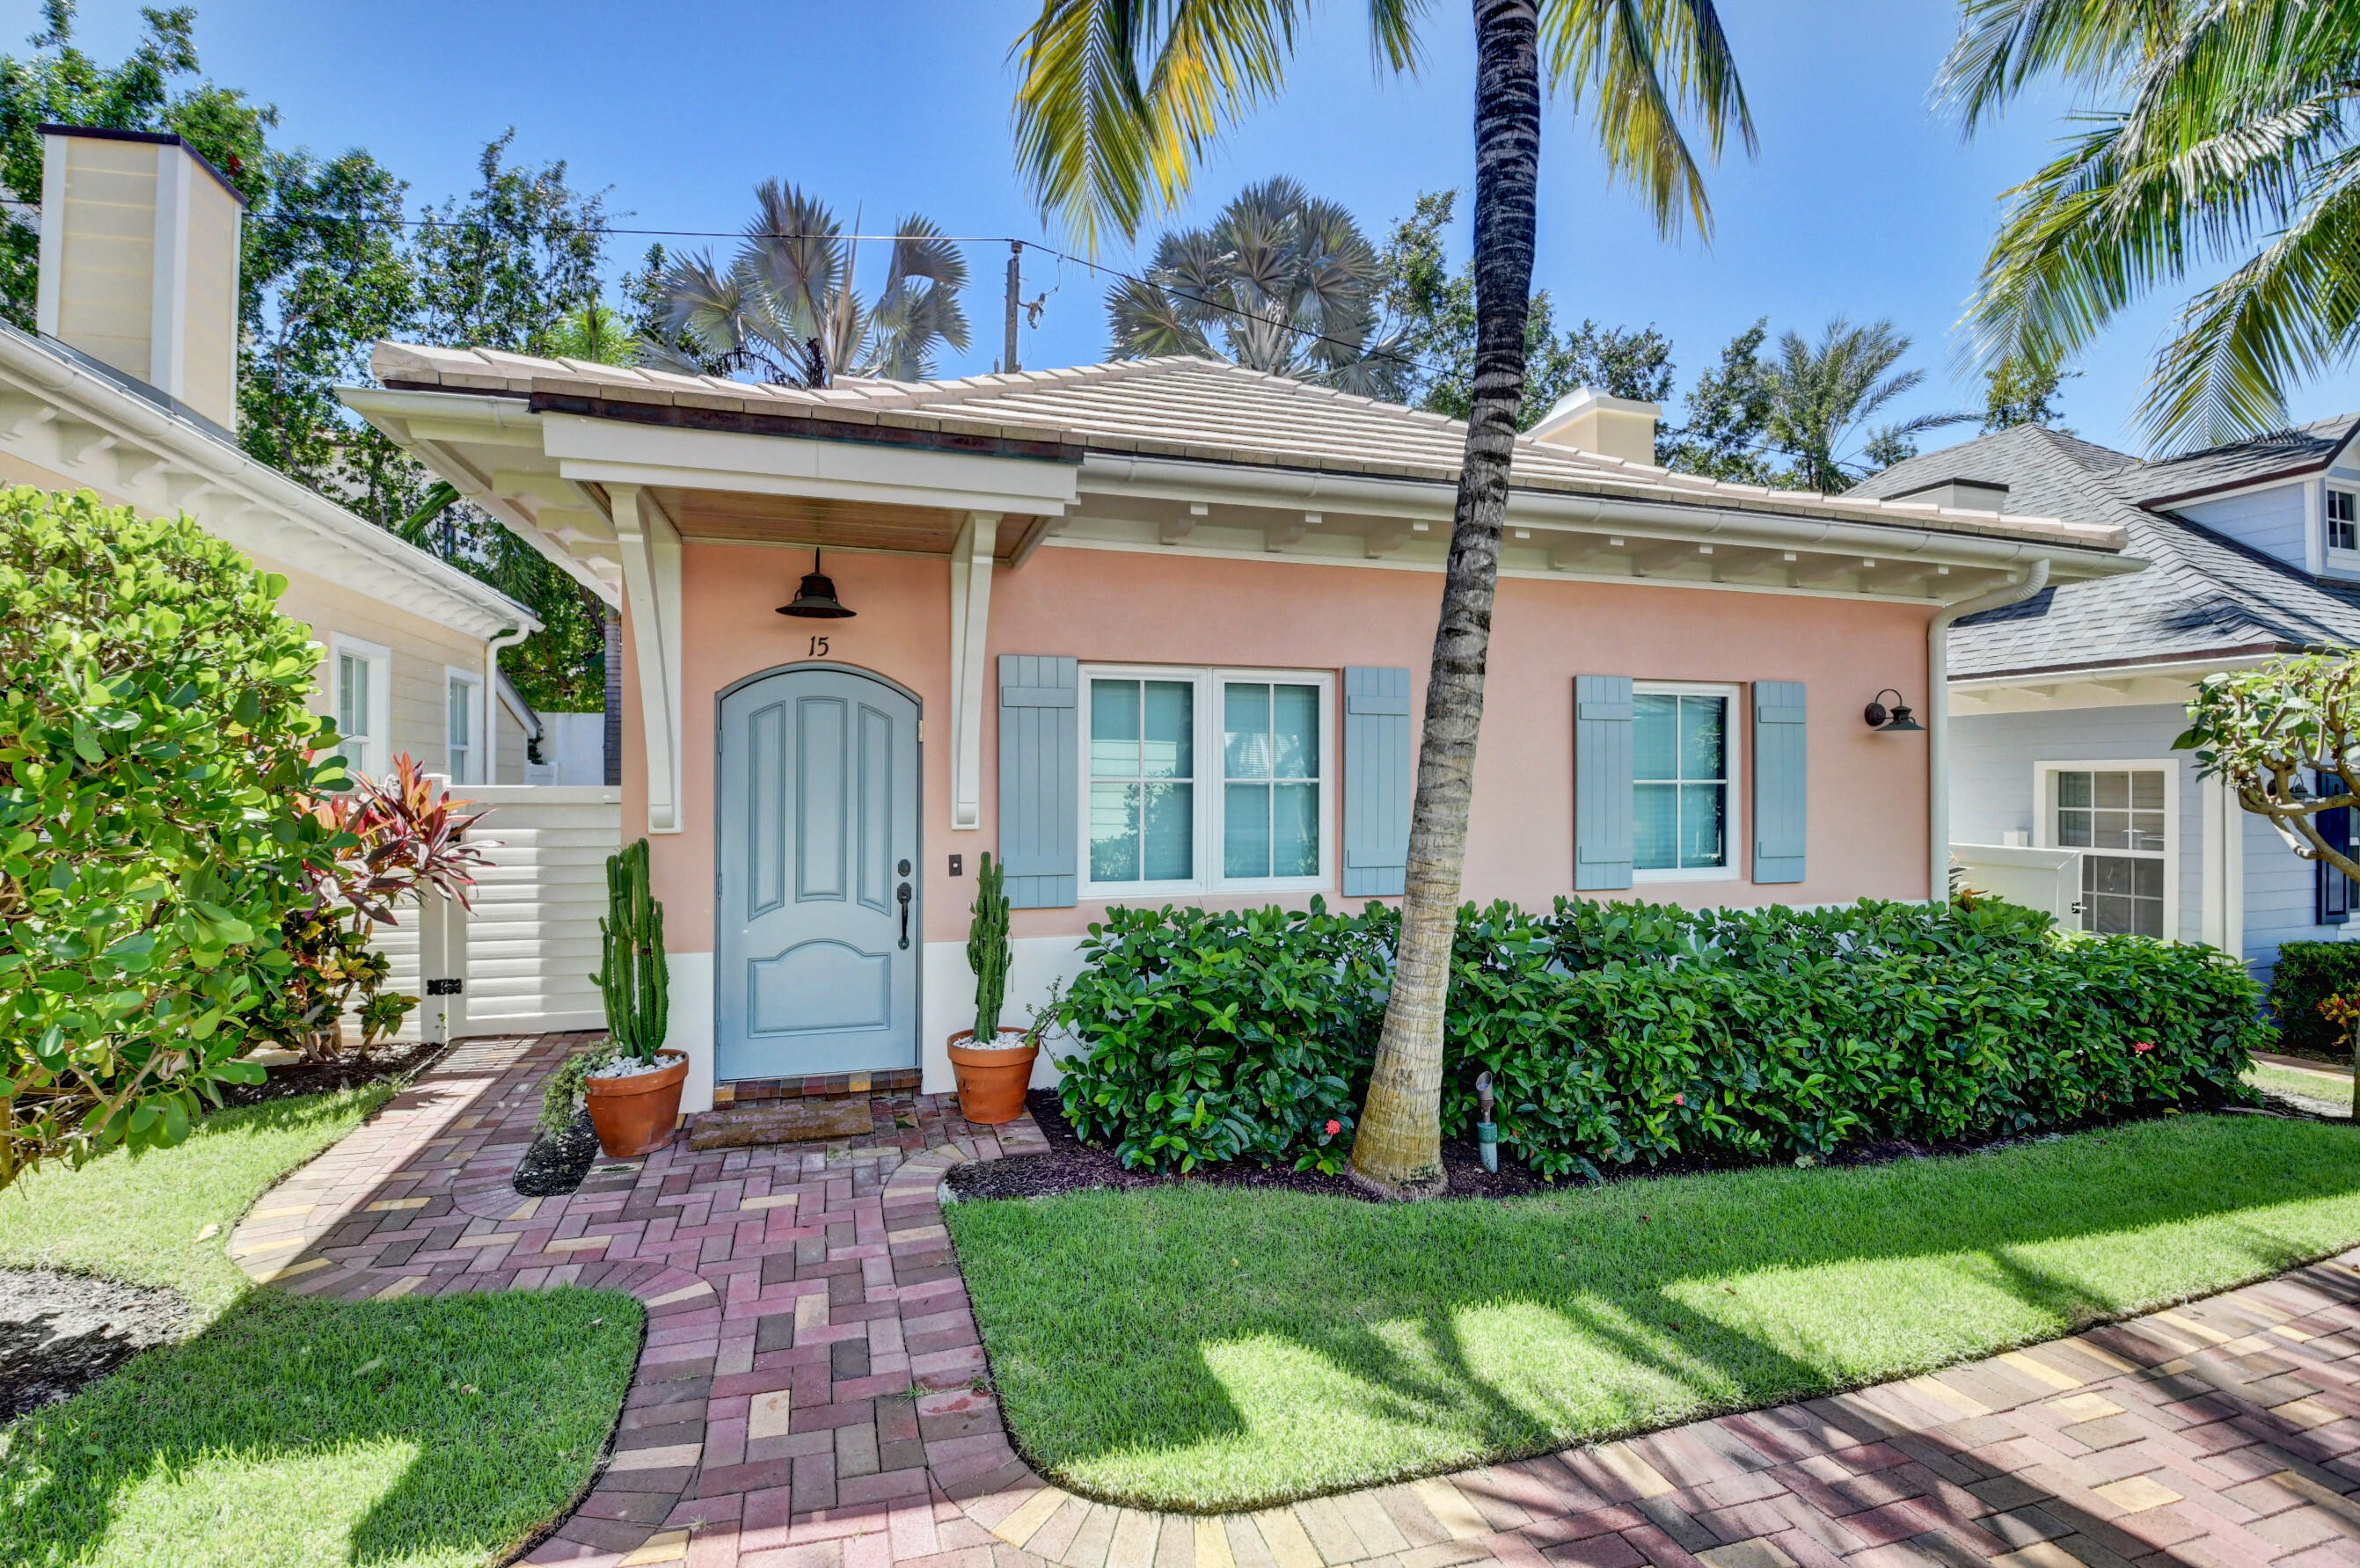 2225 Ocean Boulevard, Delray Beach, Florida 33483, 2 Bedrooms Bedrooms, ,1 BathroomBathrooms,Single Family Detached,For Sale,Ocean,RX-10748905